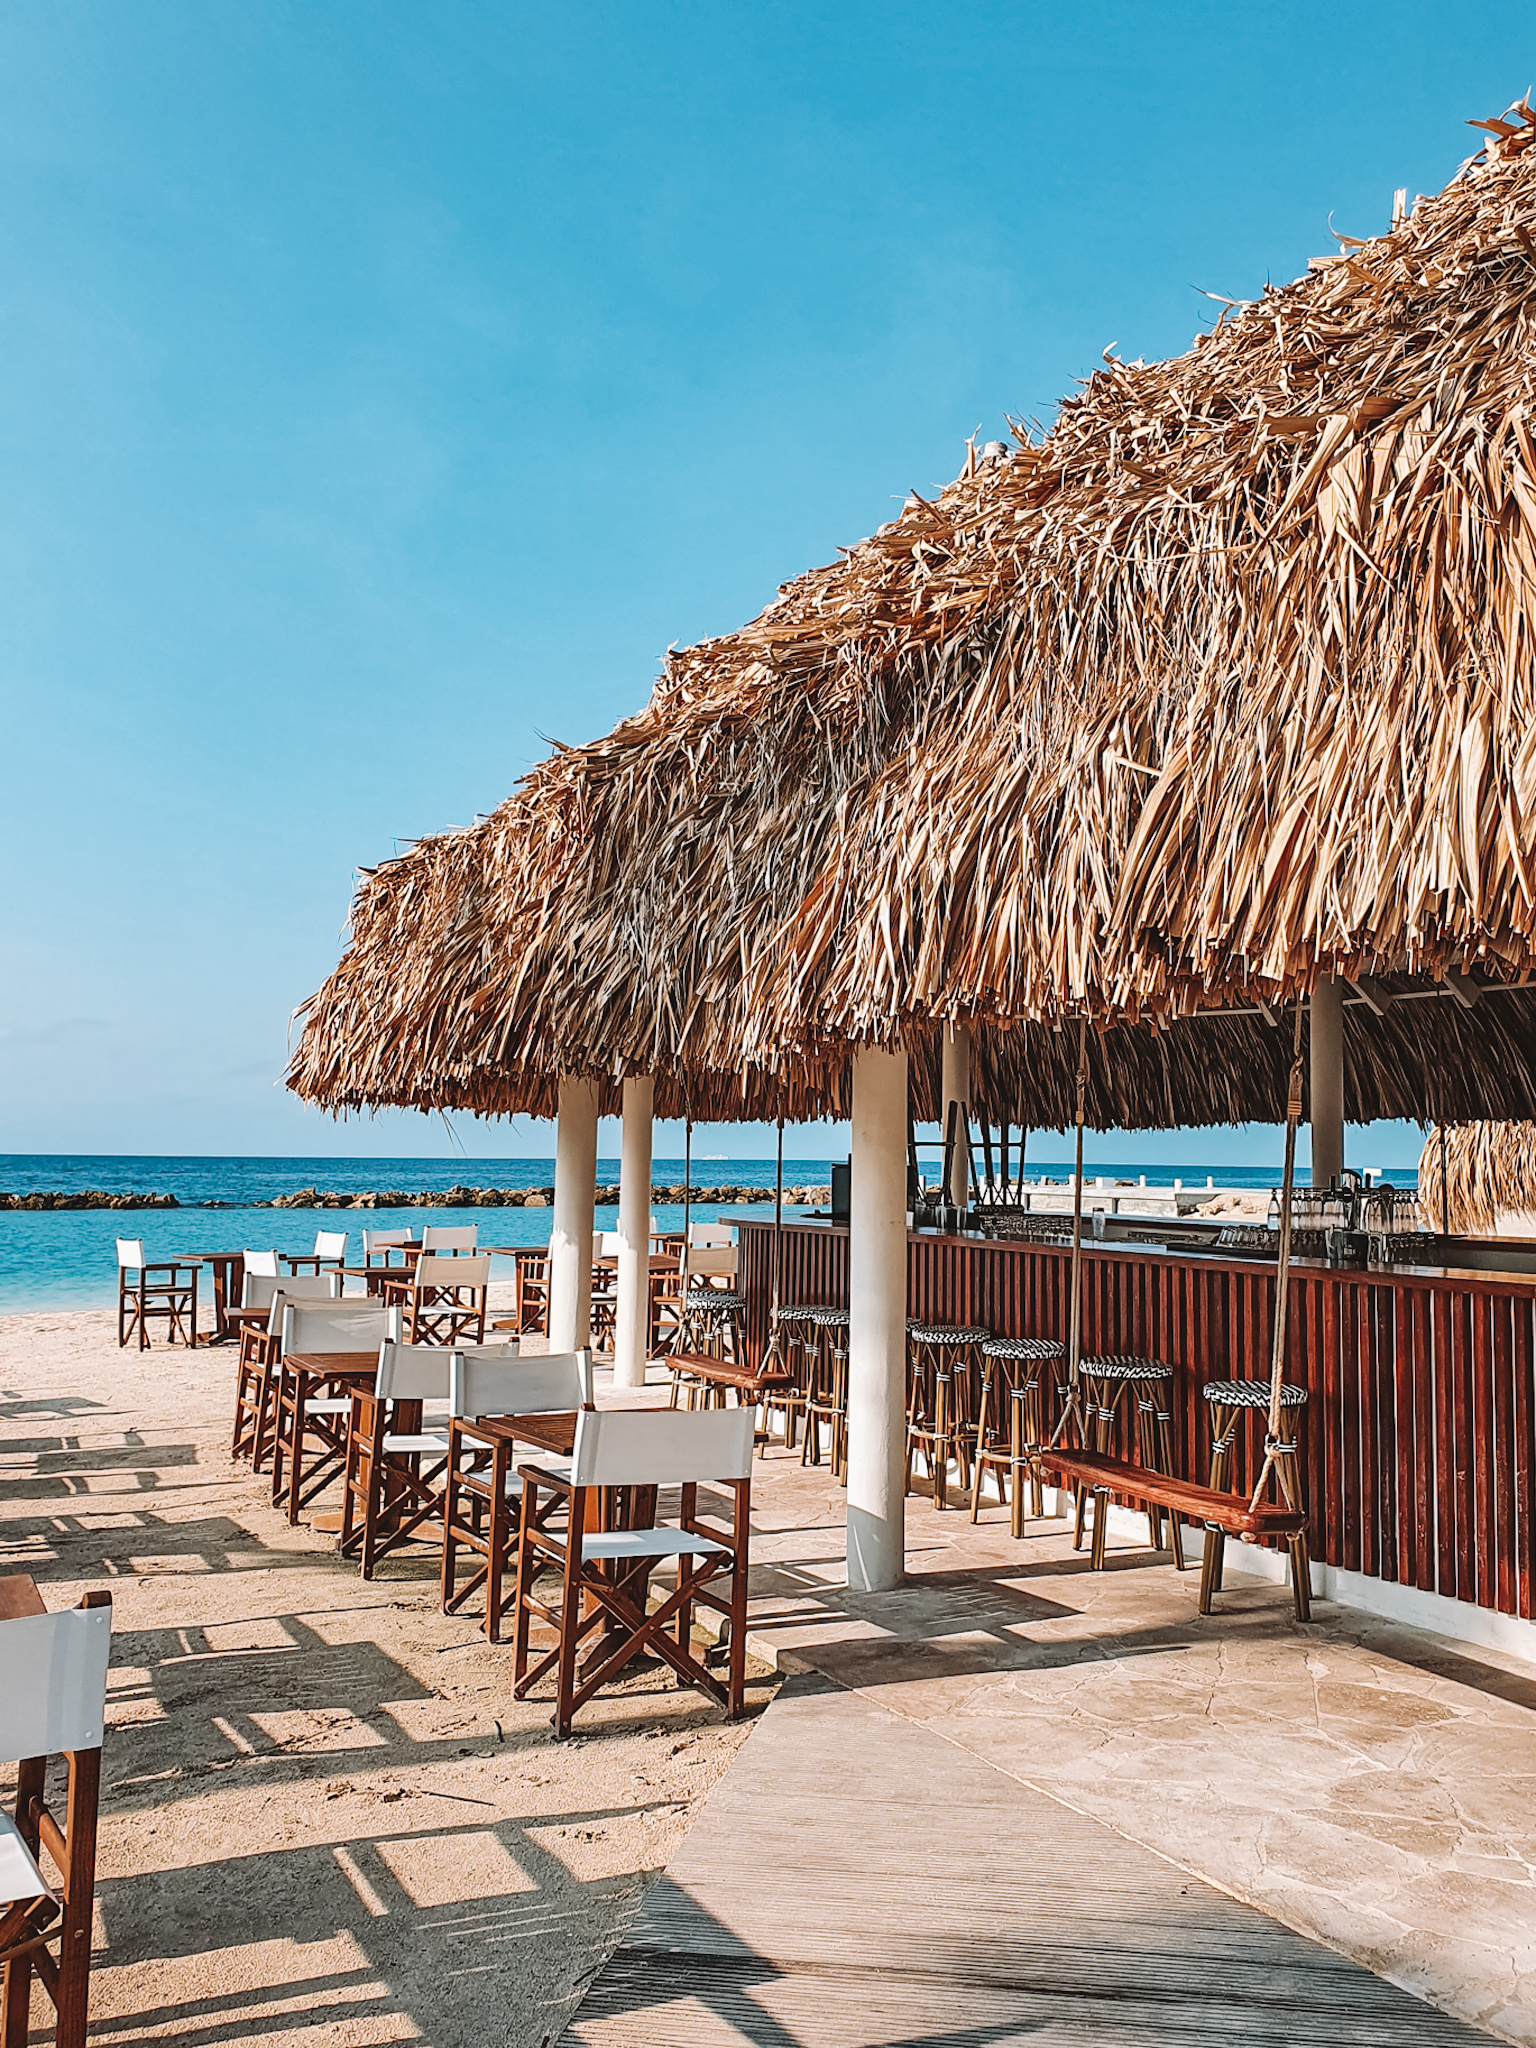 Corendon Mangrove Beach Resort Bar, Curaçao